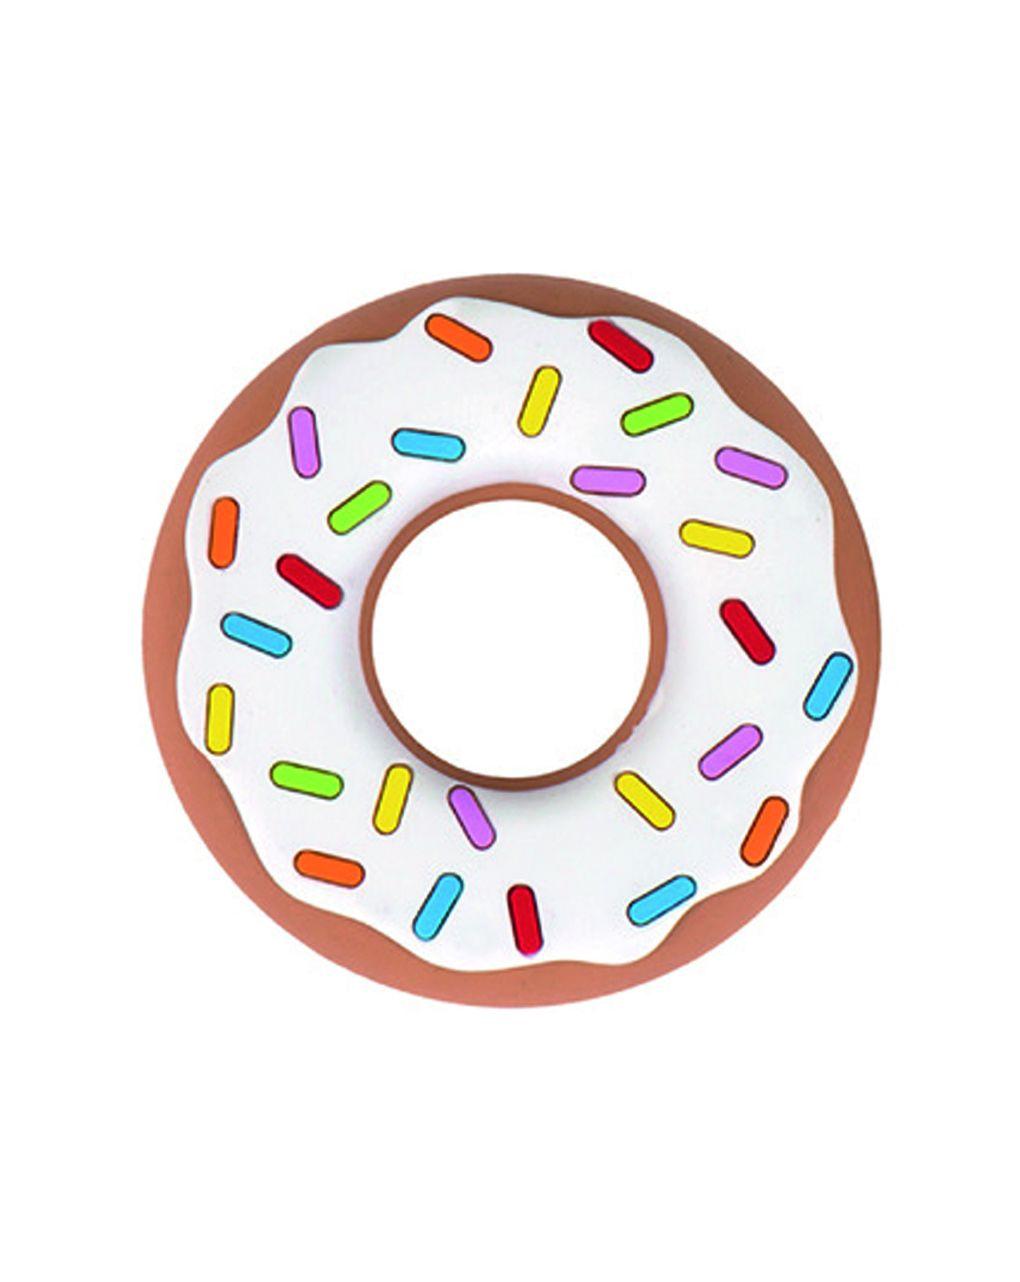 Sille mastiga - donut de baunilha - Sille Chews